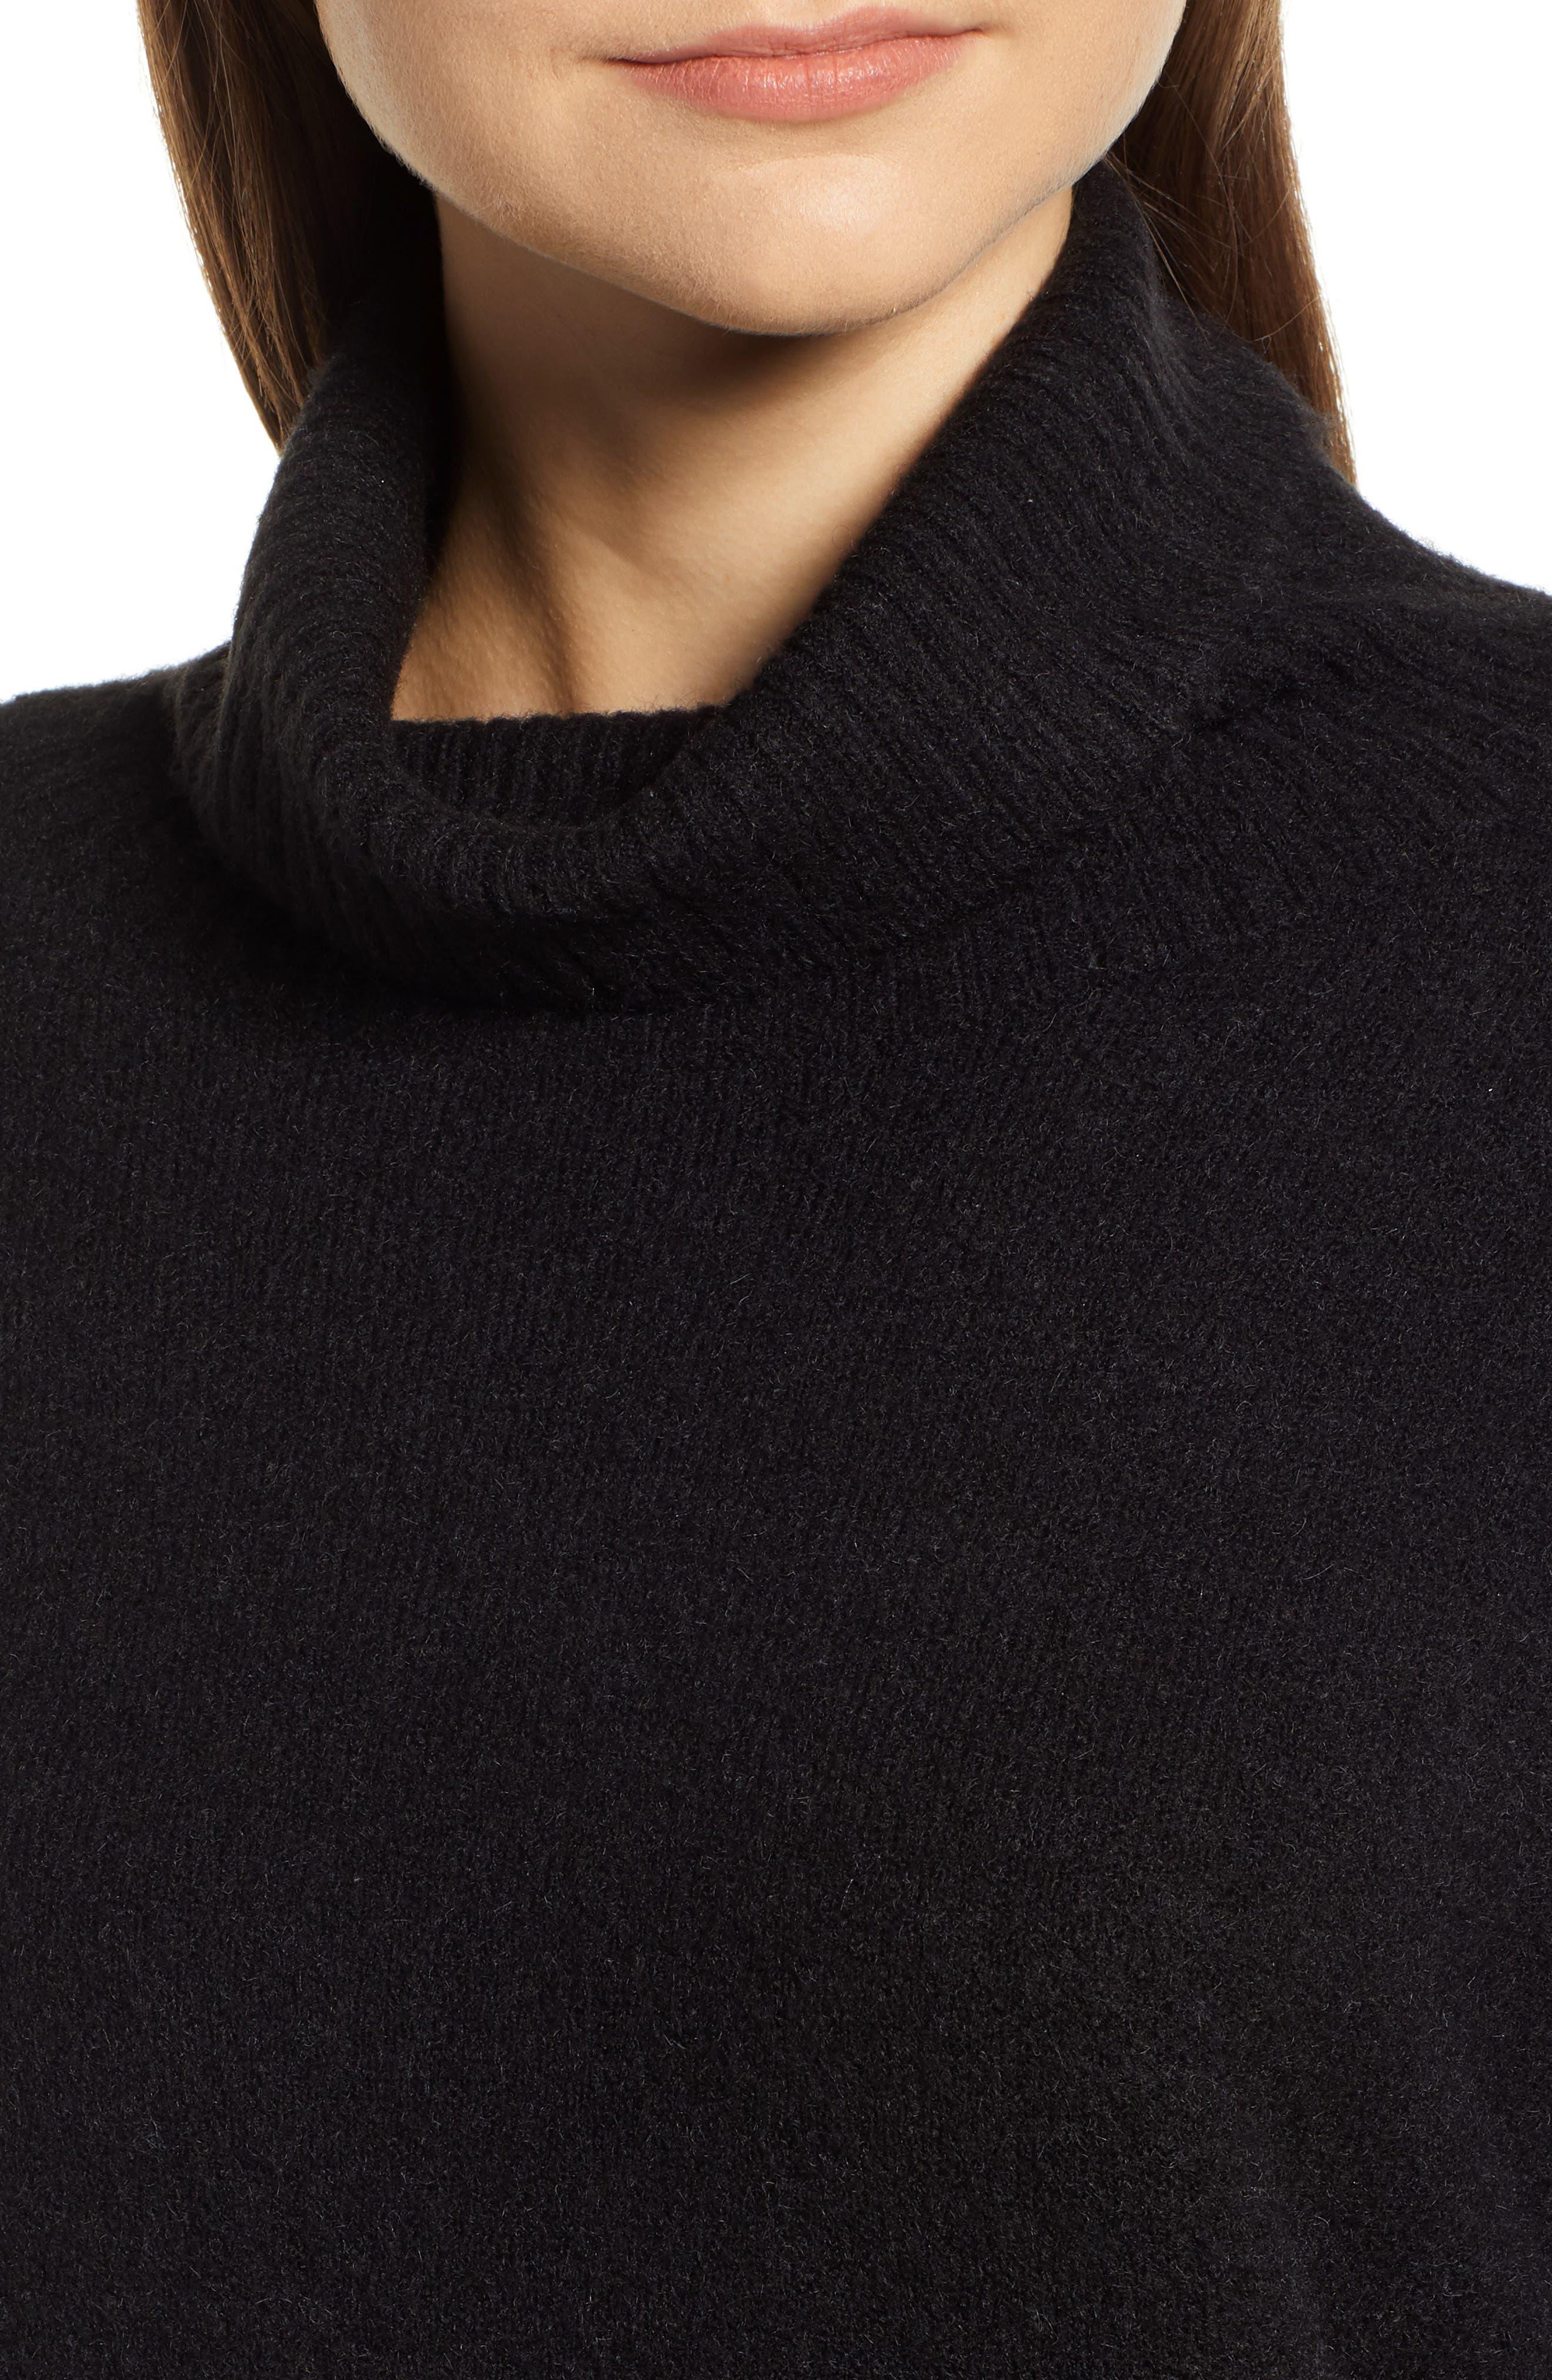 HINGE,                             Bell Sleeve Sweater,                             Alternate thumbnail 4, color,                             BLACK